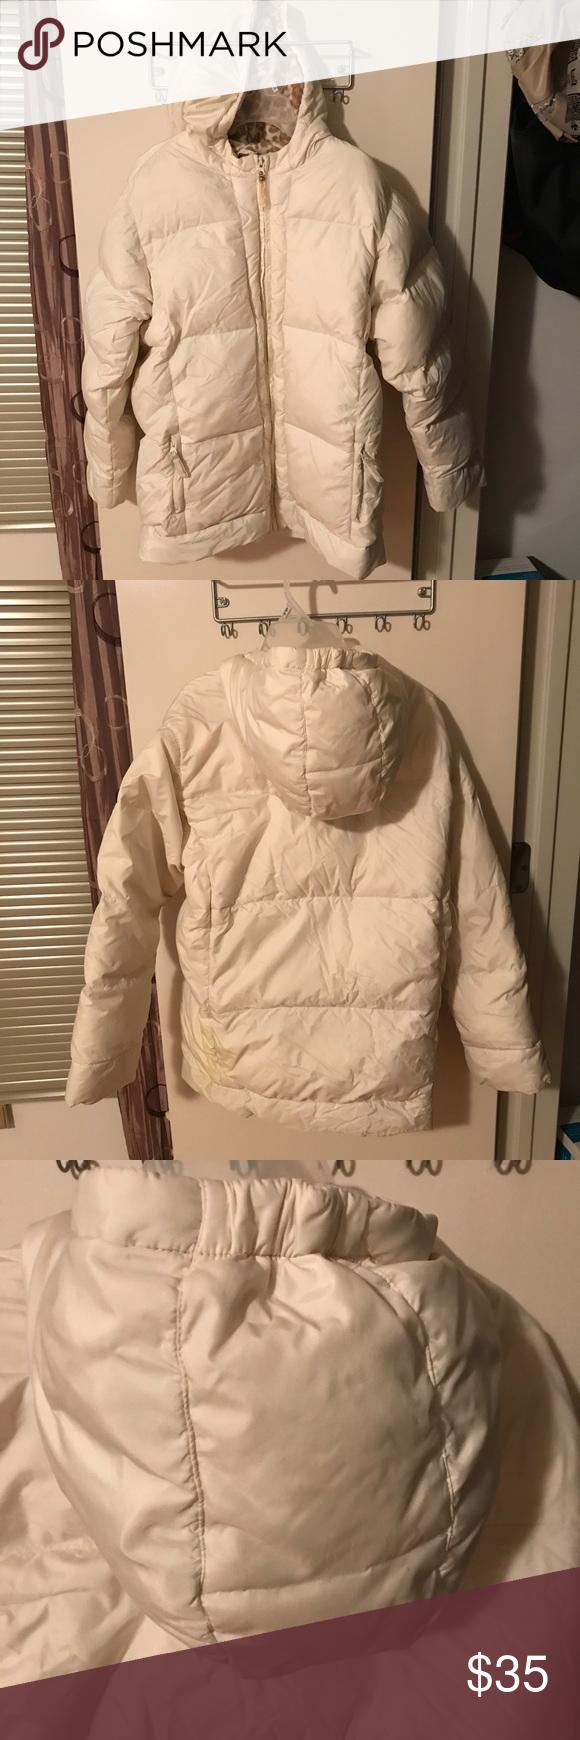 Old Navy White Puffer Jacket Super Soft And Warm Girls Puffer Jacket Inside Is A Fleece Material Easy To Wash White Puffer Jacket Girls Puffer Jacket Jackets [ 1740 x 580 Pixel ]